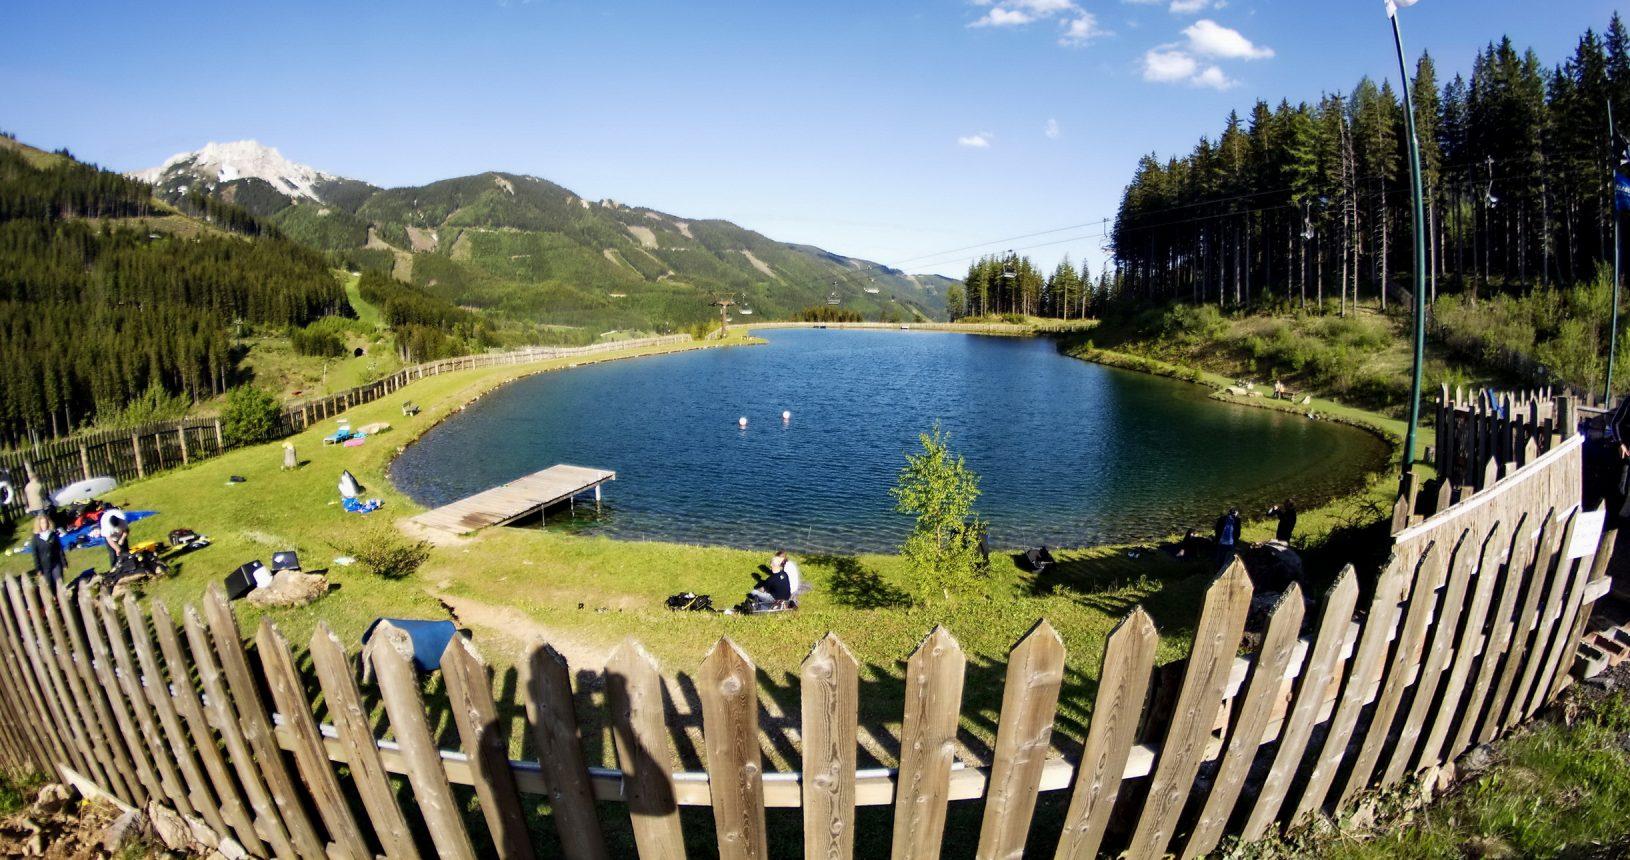 Alpesi szállás - www.alpesikaland.hu - Hotel-Banhof - Alpesi-gyalogtúrák12